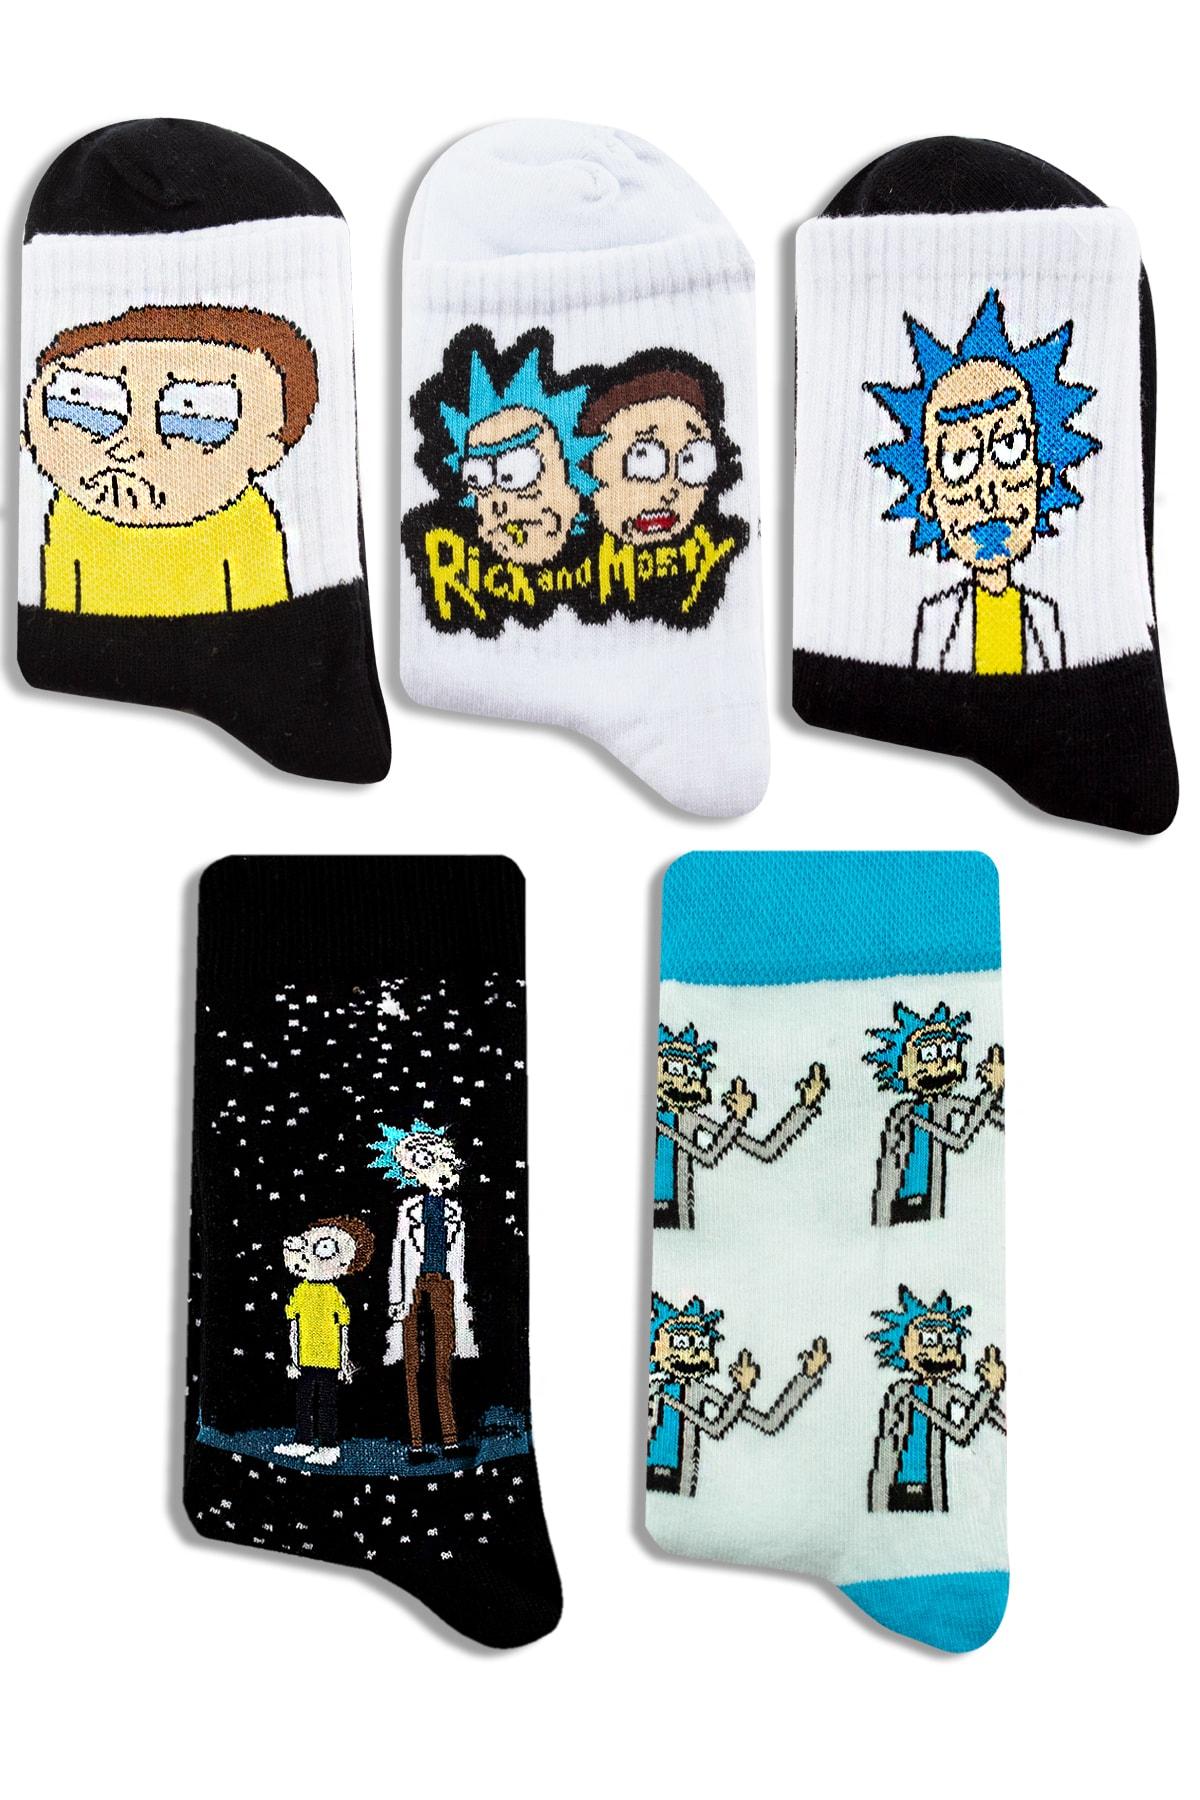 Socksarmy Rick & Morty Desenli 5 'li Renkli Çorap Seti 1